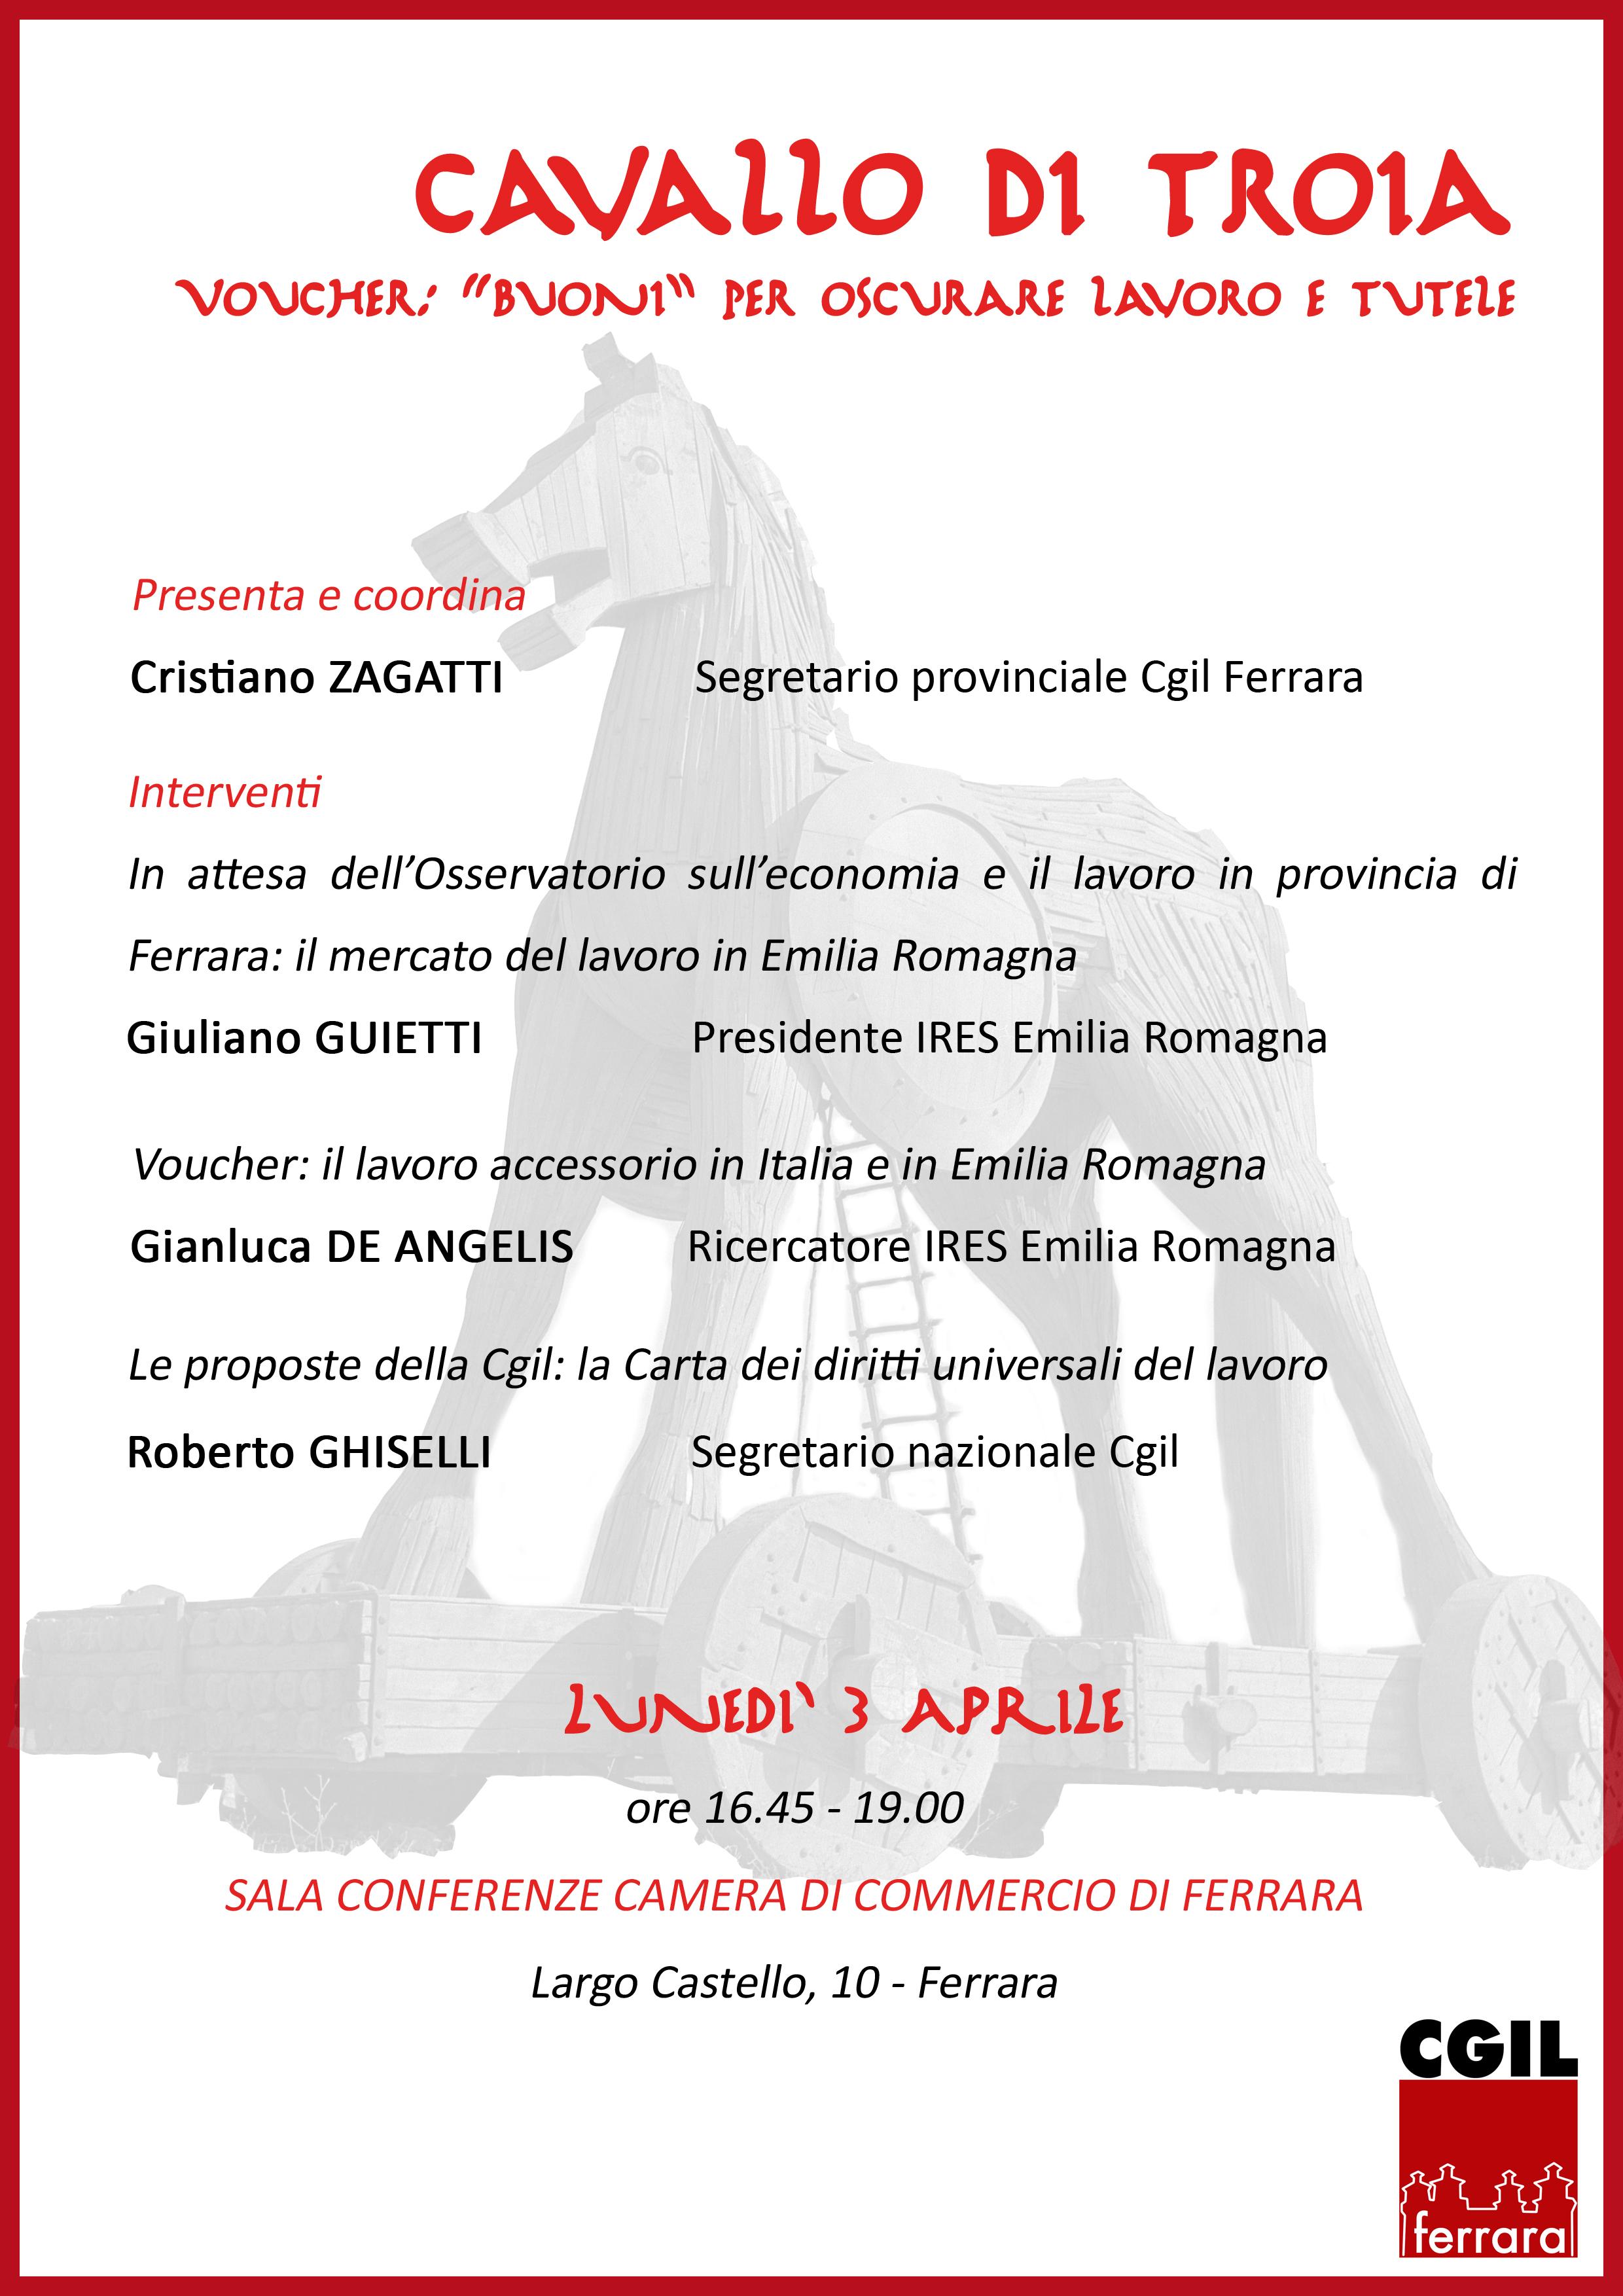 Lunedì 3 aprile a Ferrara giornata interamente dedicata a #referendumlavoro